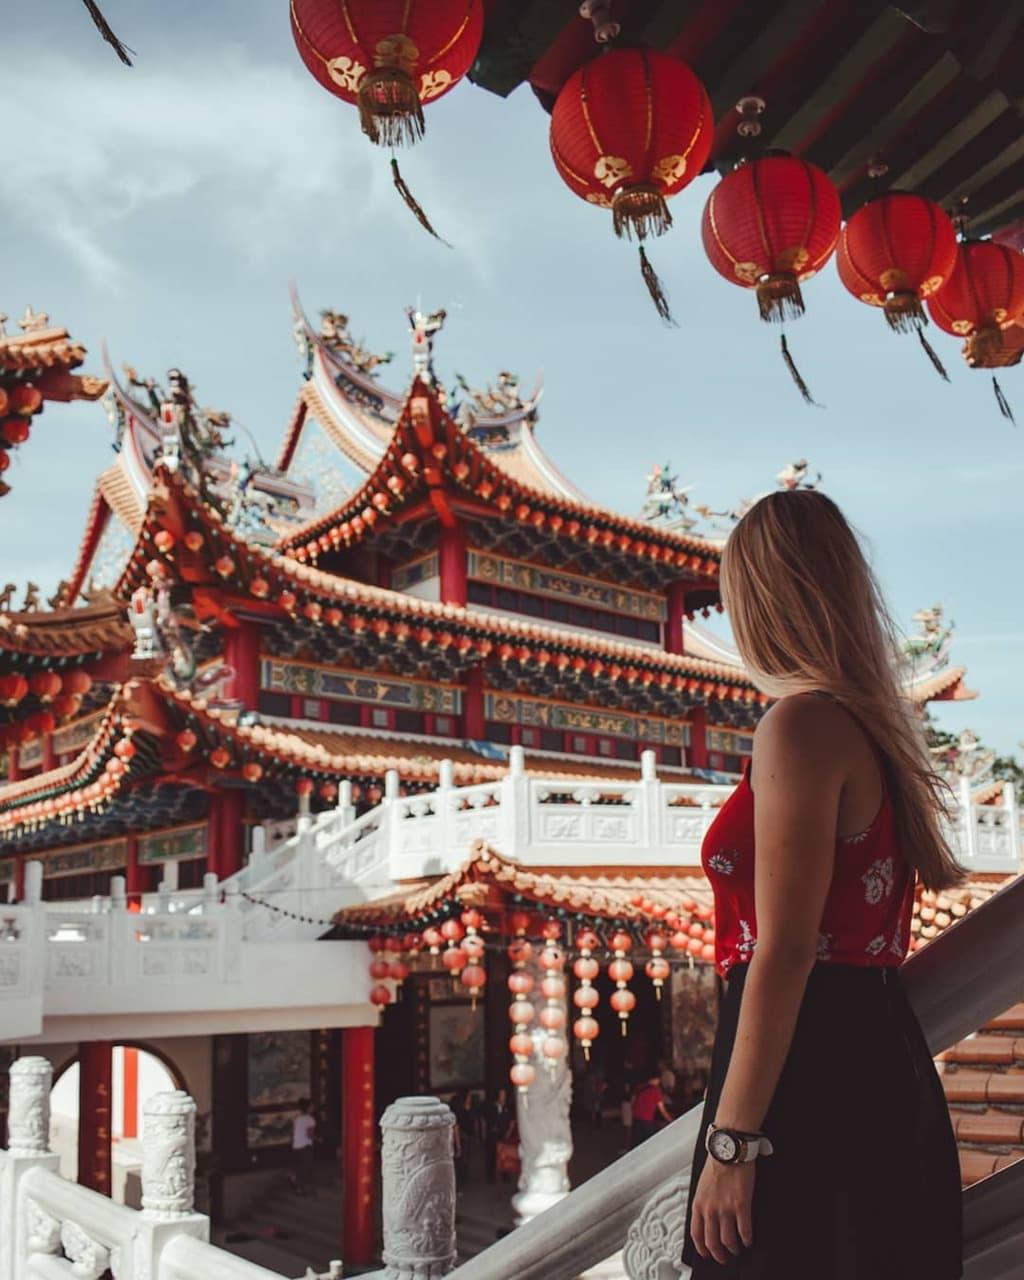 Thean Hou Temple, Kuala Lumpur, by @imlostinwanderlust